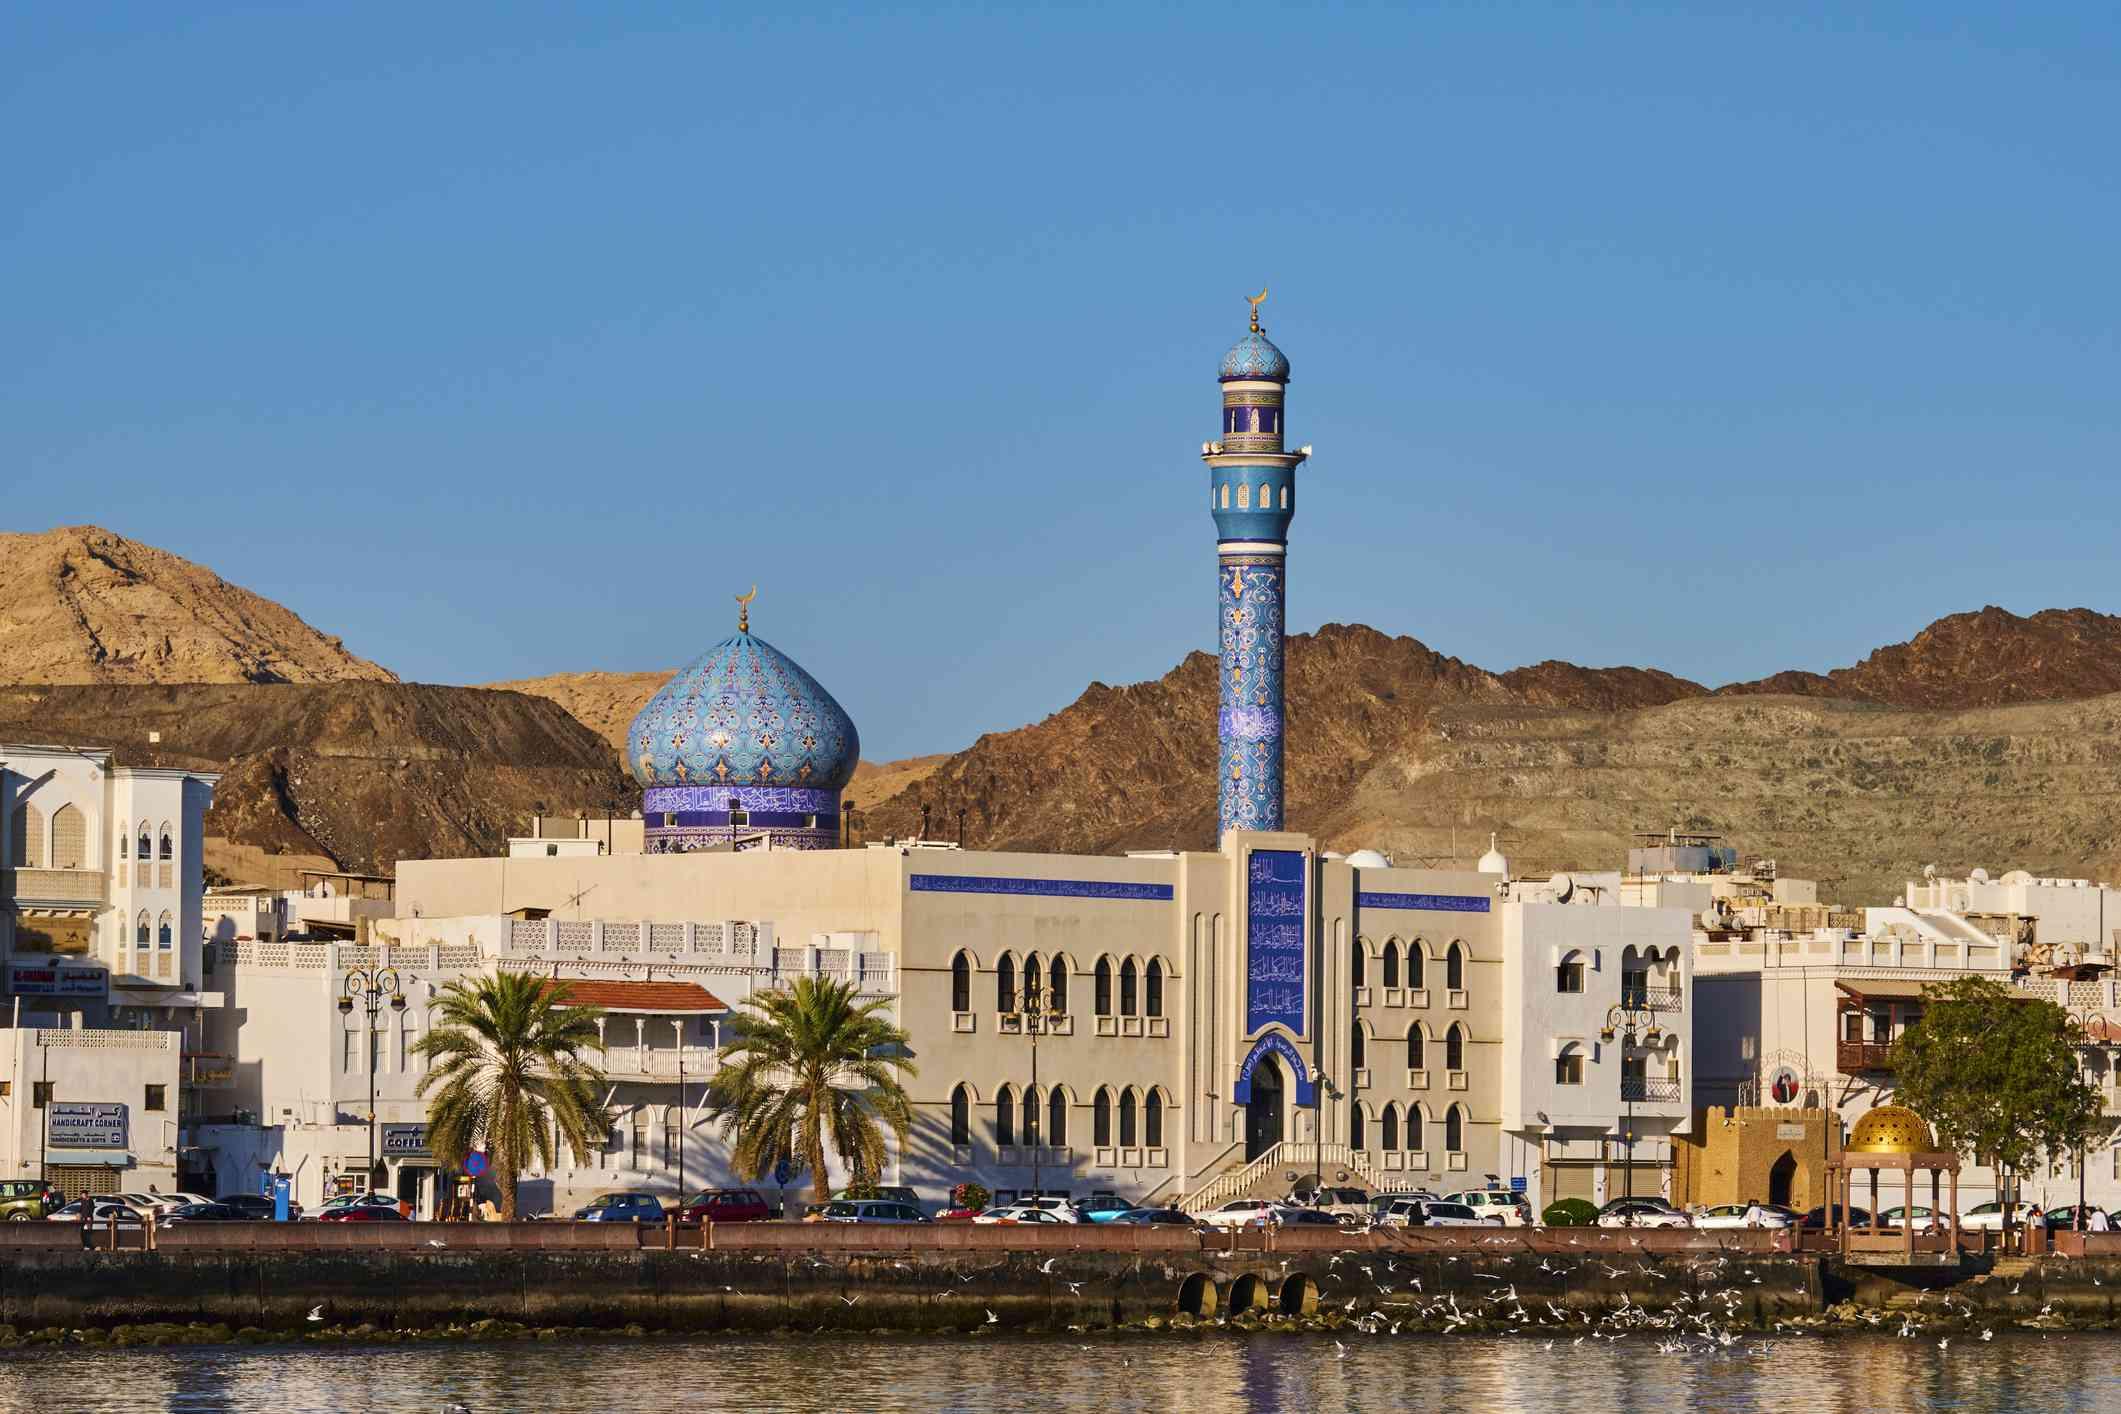 Sultanate of Oman, Muscat, the corniche of Muttrah